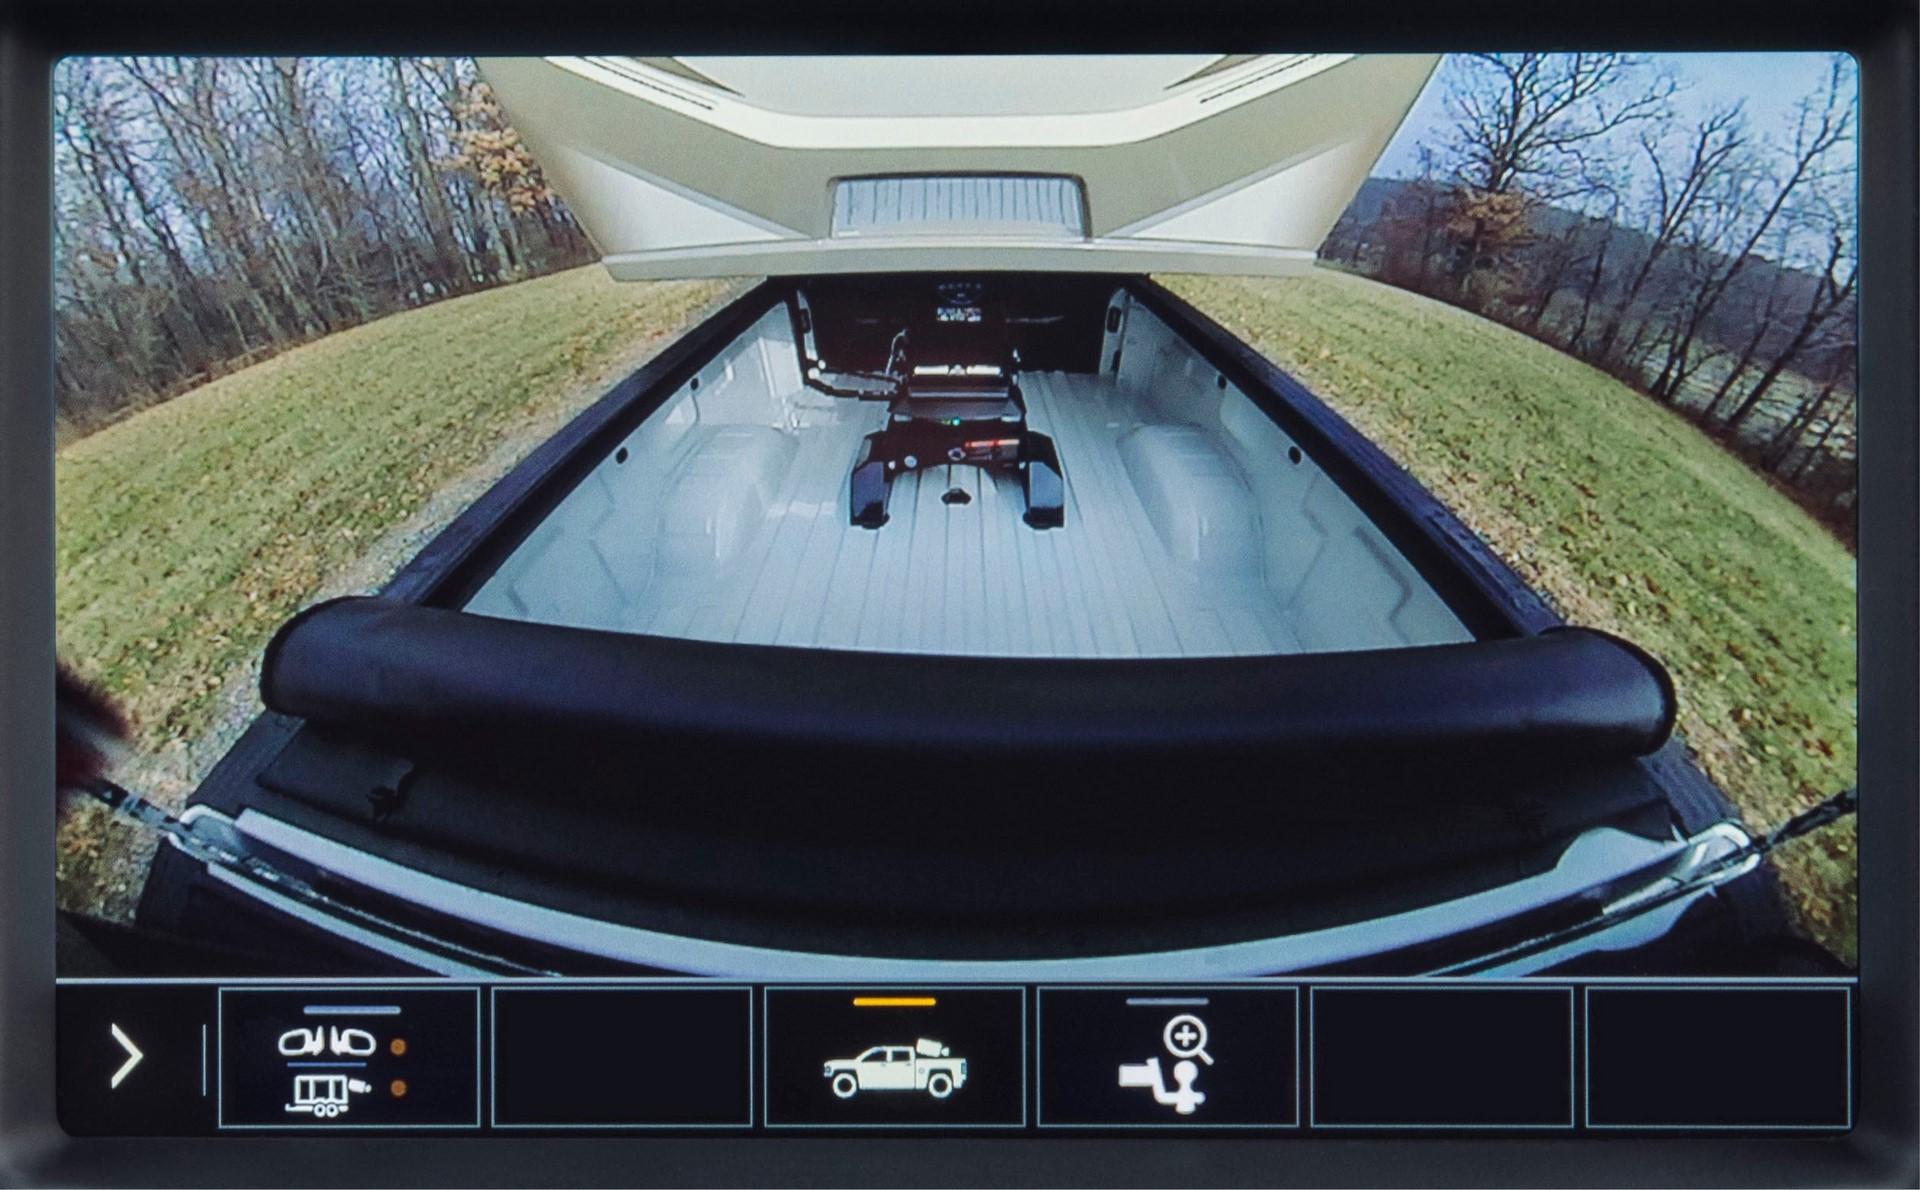 2020 GMC Sierra HD Bed View Camera